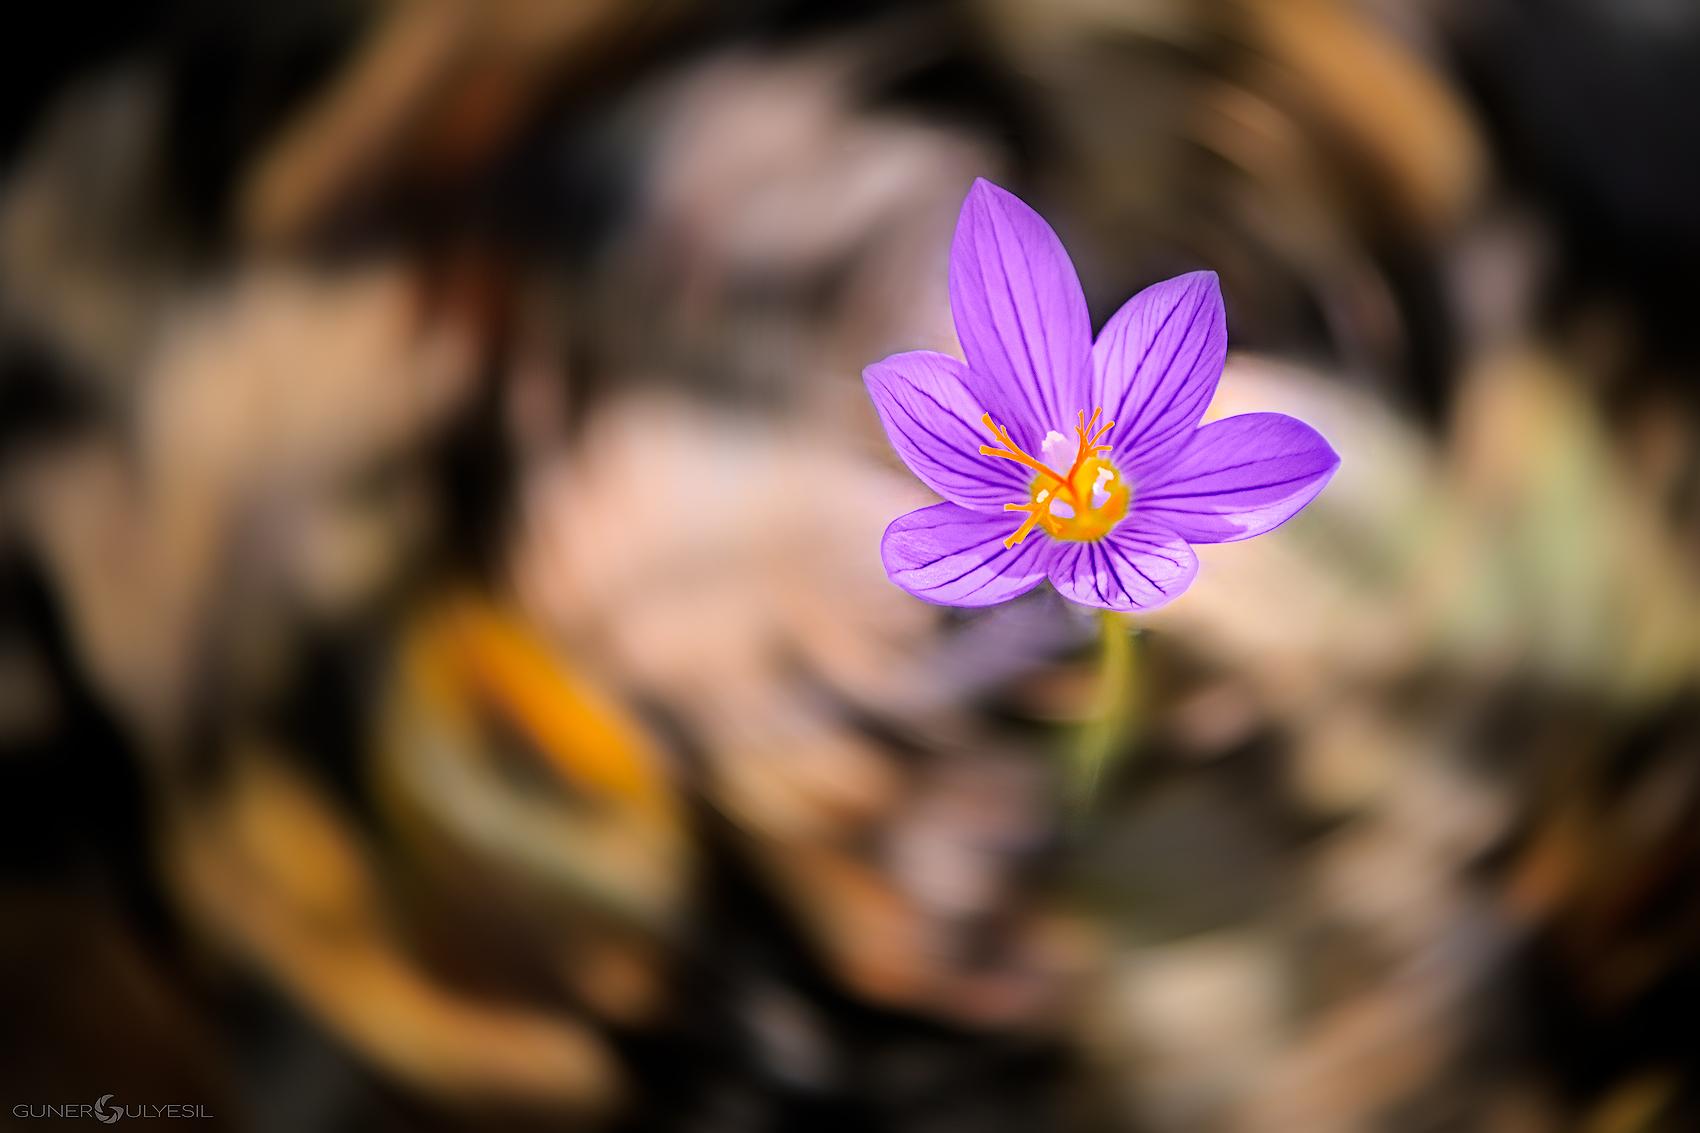 sonbaharda doğa fotoğrafçılığı